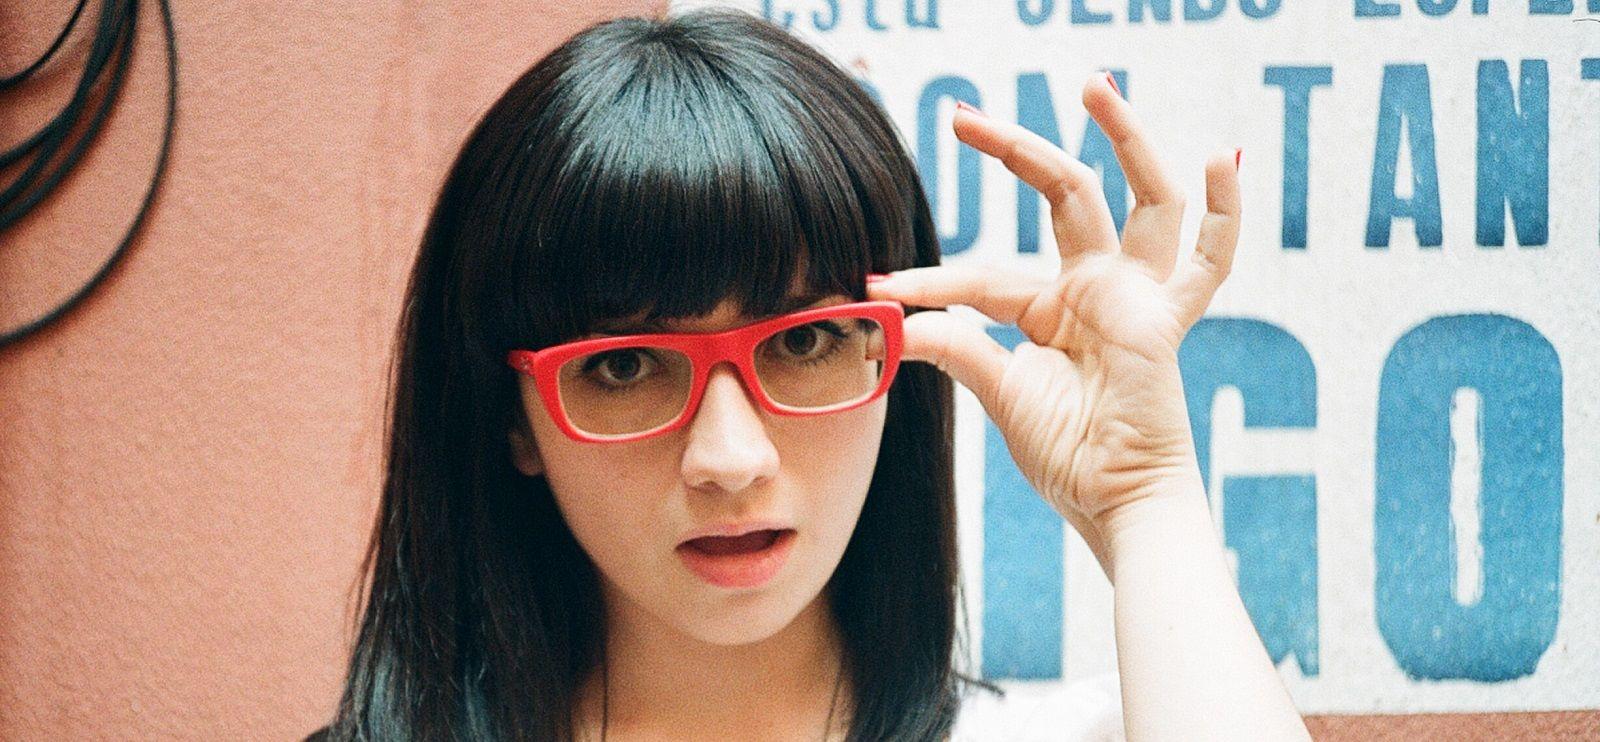 Indossa occhiali online dating